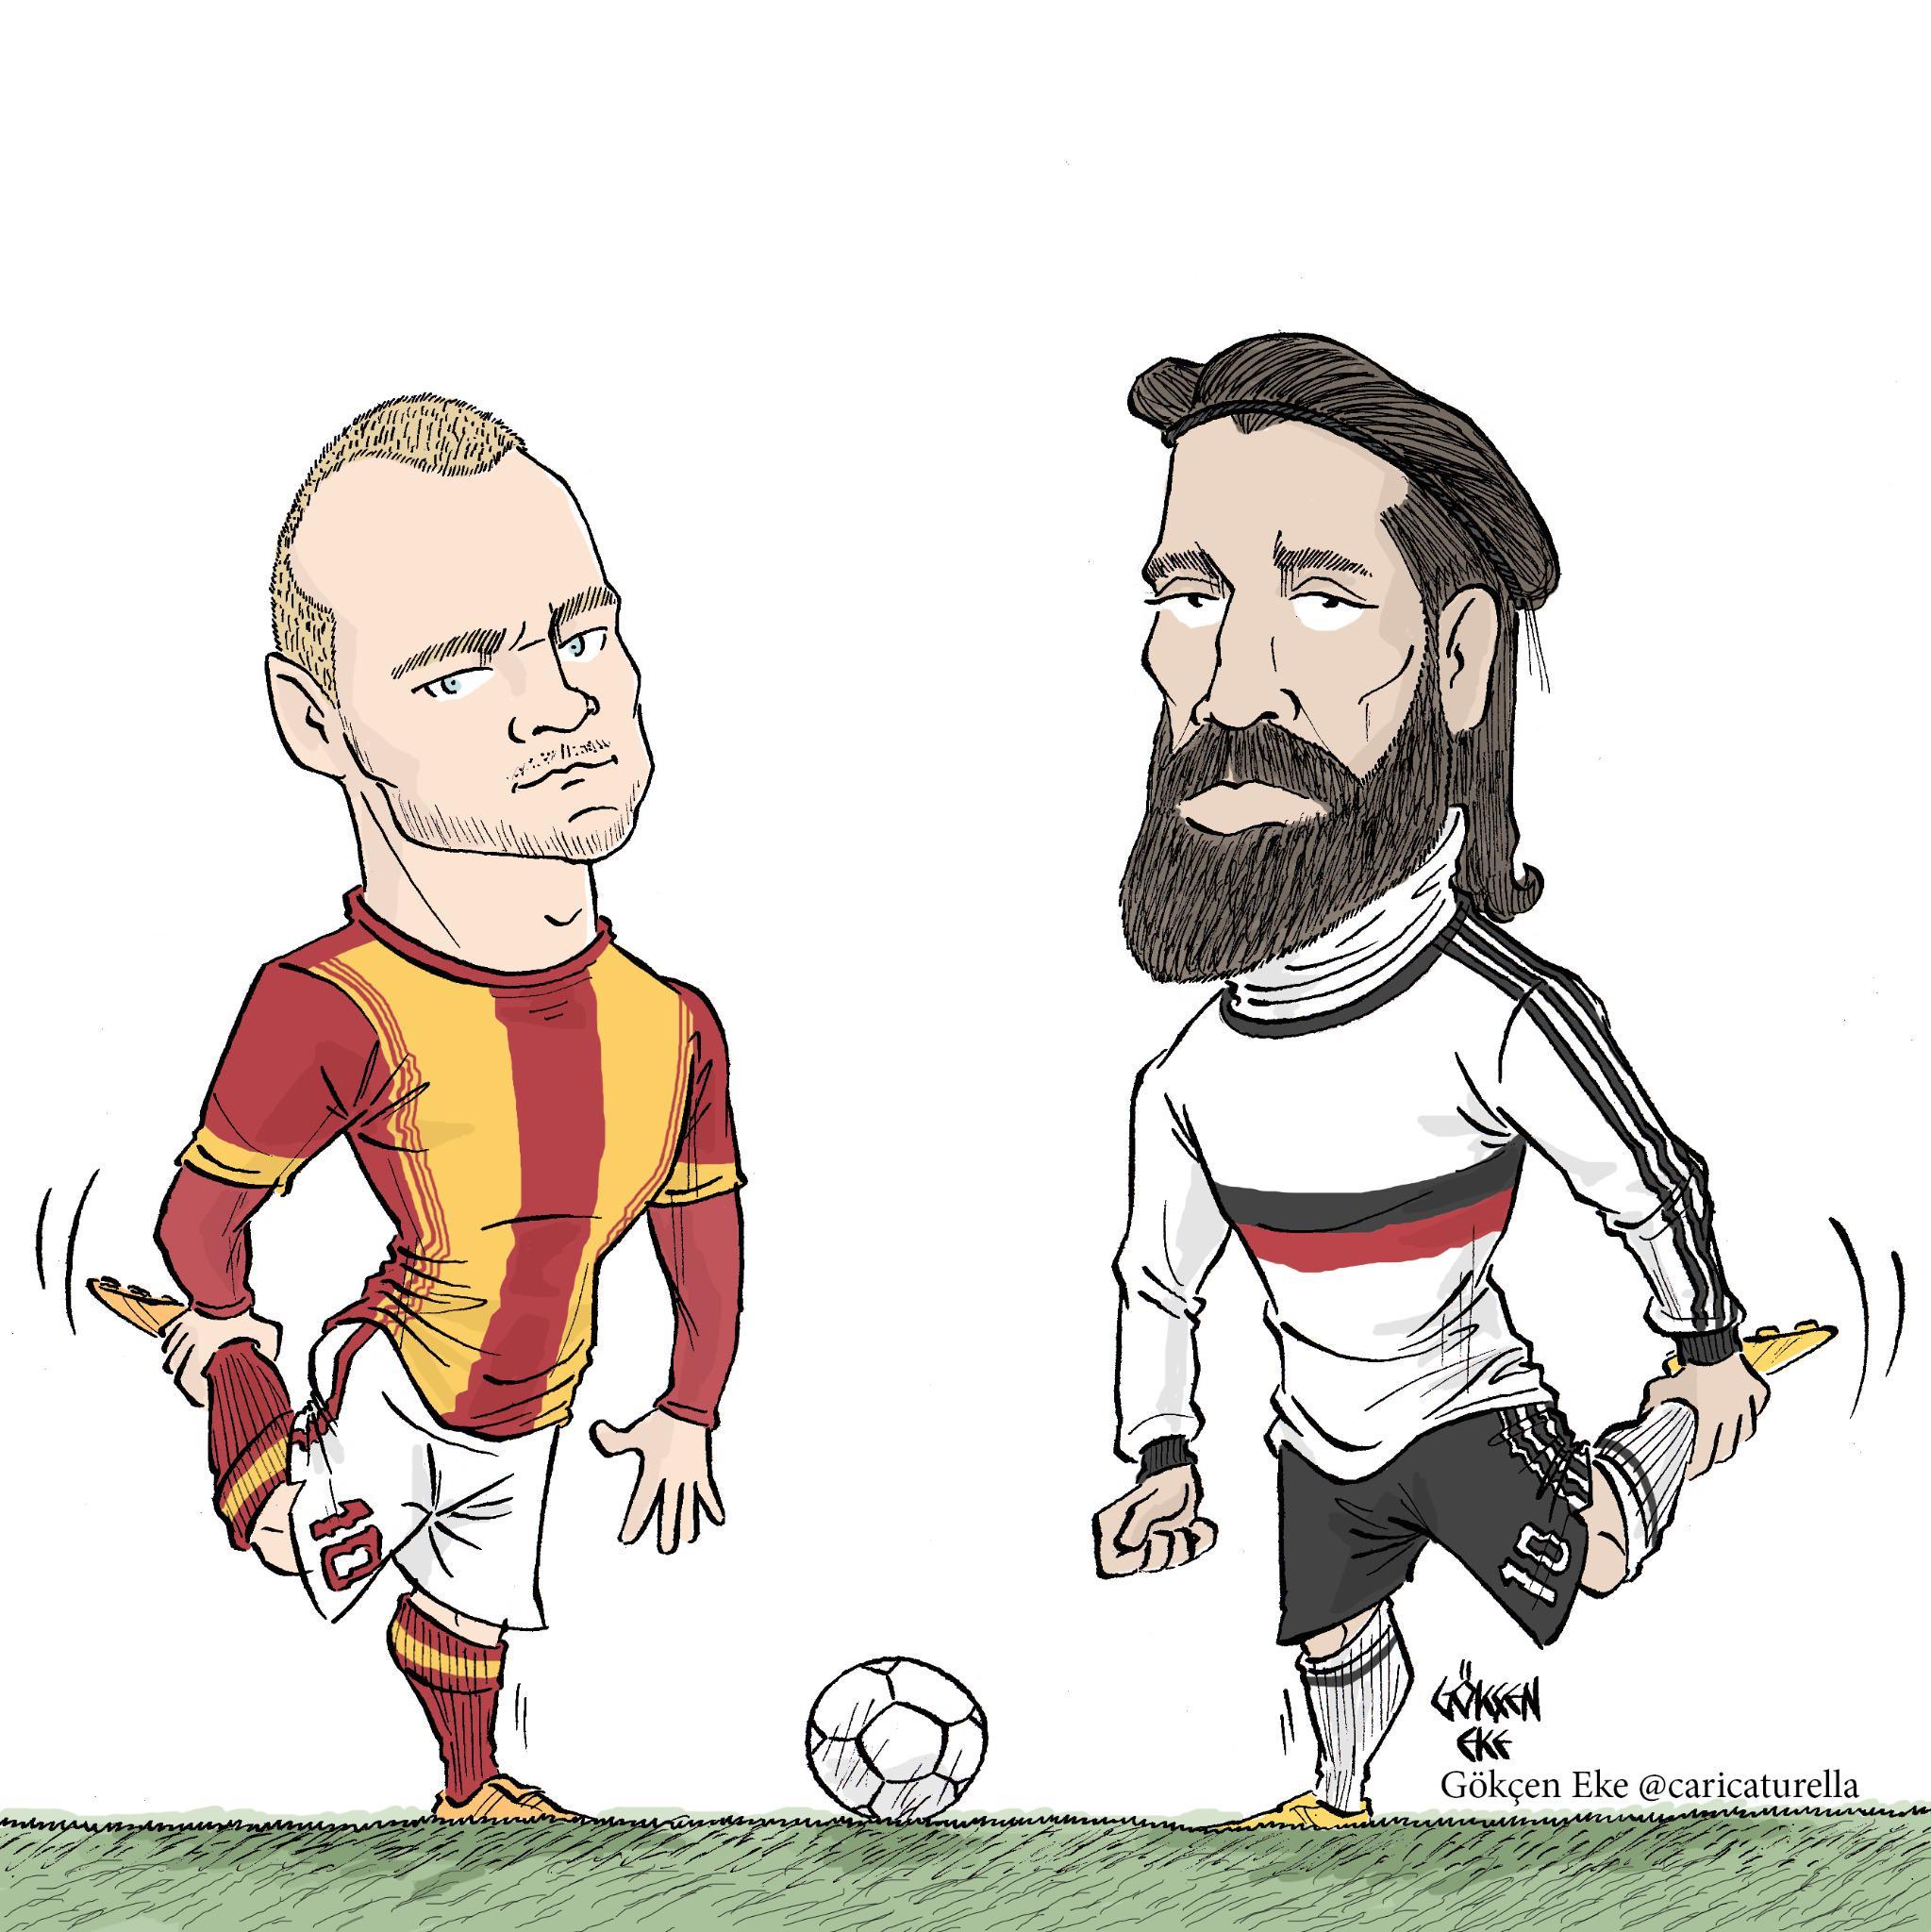 RT @caricaturella: M?thi? sa? m?? M?thi? sol mu? #WesleySneijder #Olcay?ahan #Be?ikta? #Galatasaray #BJKGS #Derbi #OlimpiyatStad? #STSL htt?